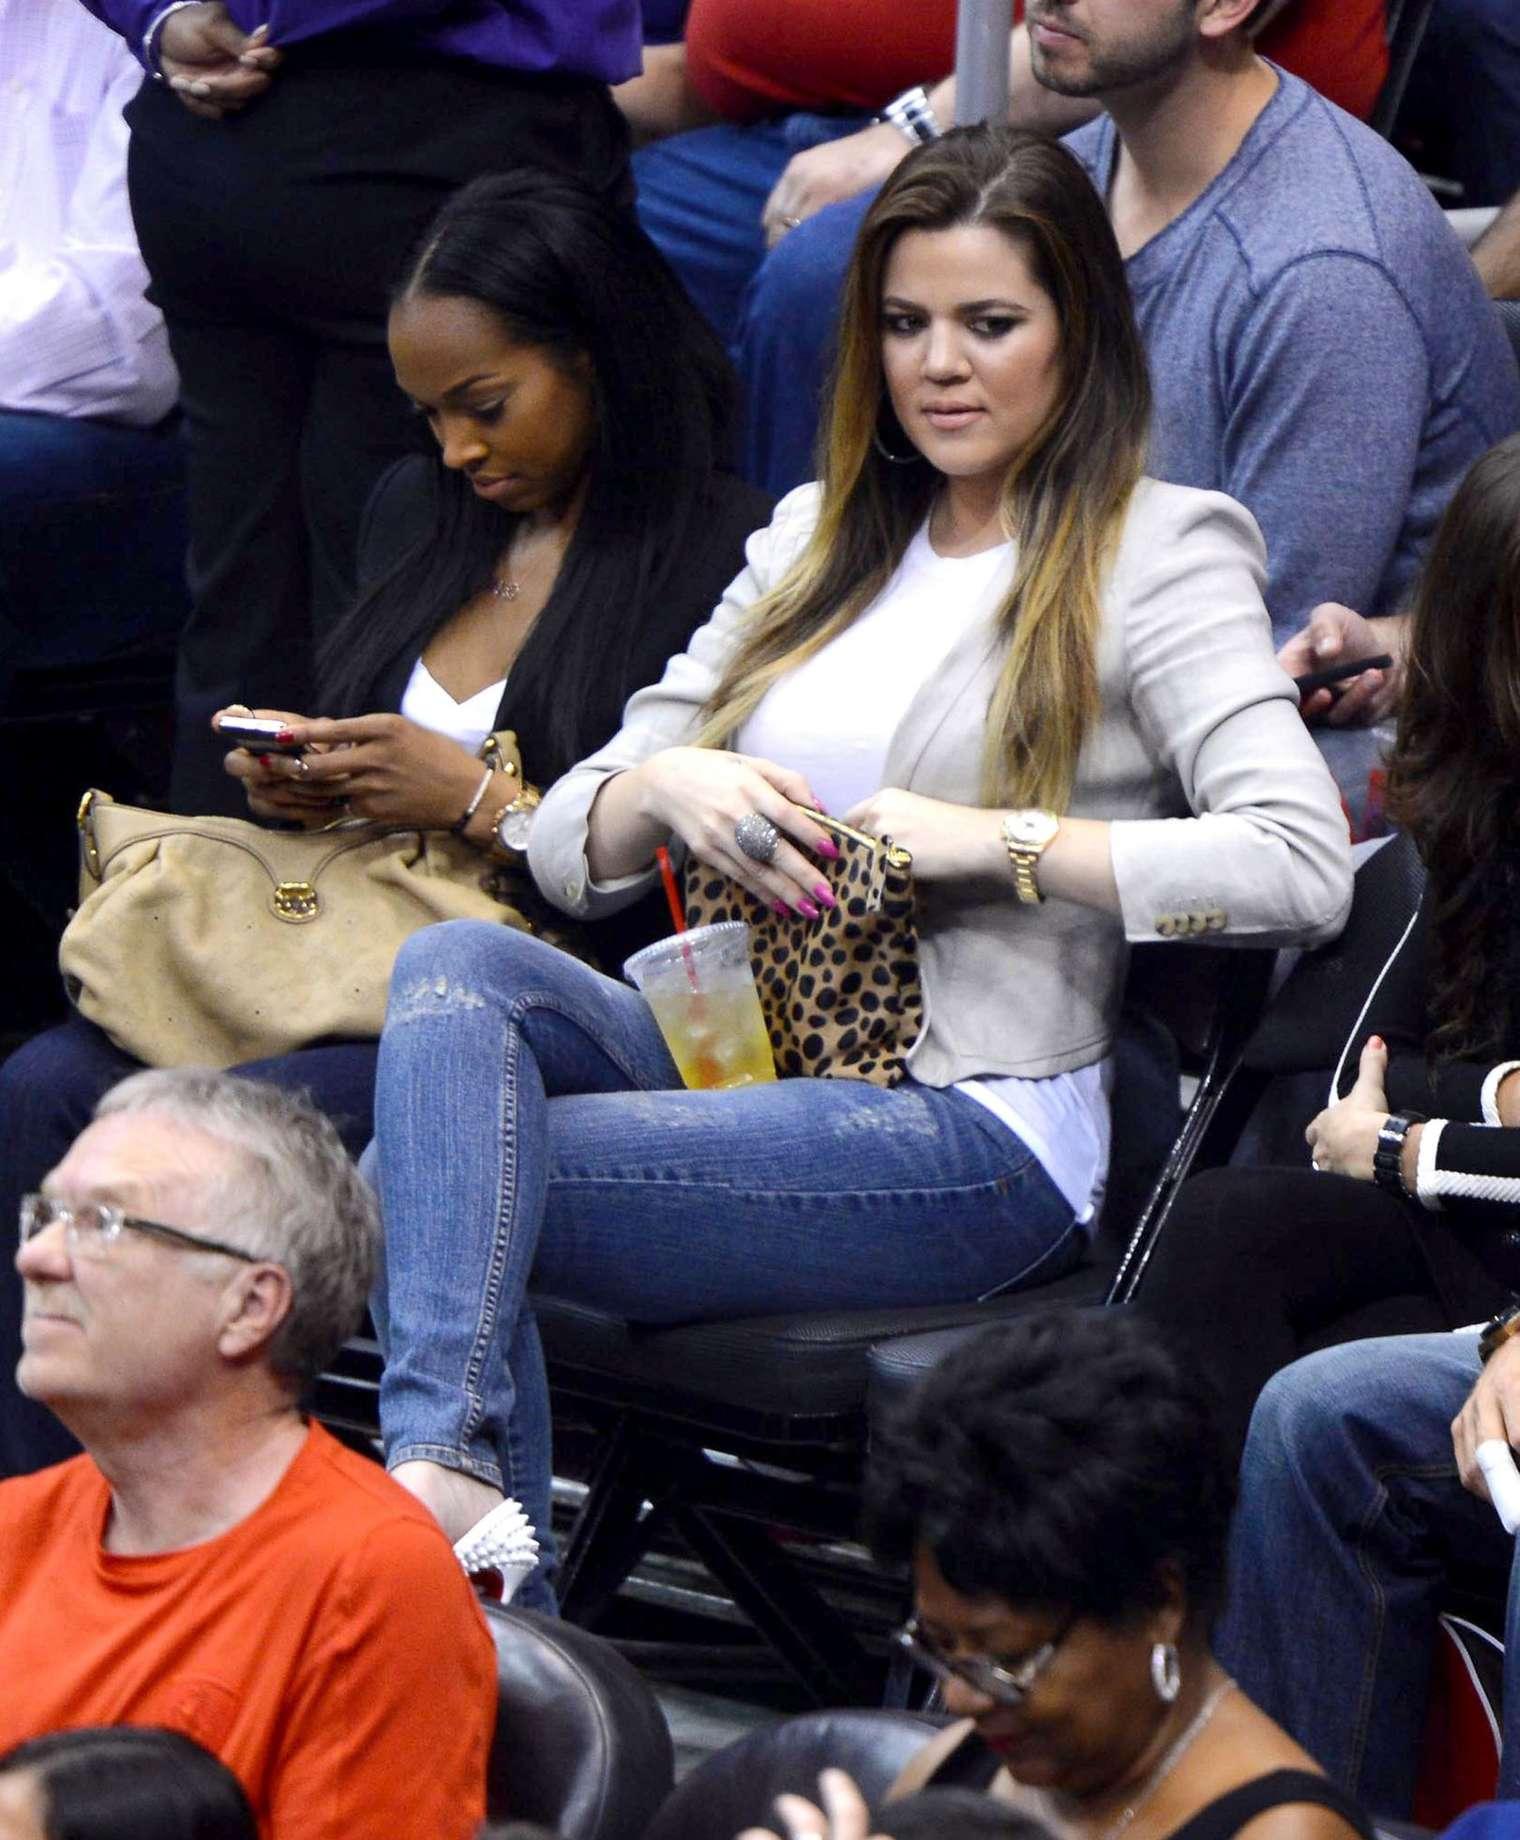 Khloe Kardashian 2013 : Khloe Kardashian at the LA Clippers game -11